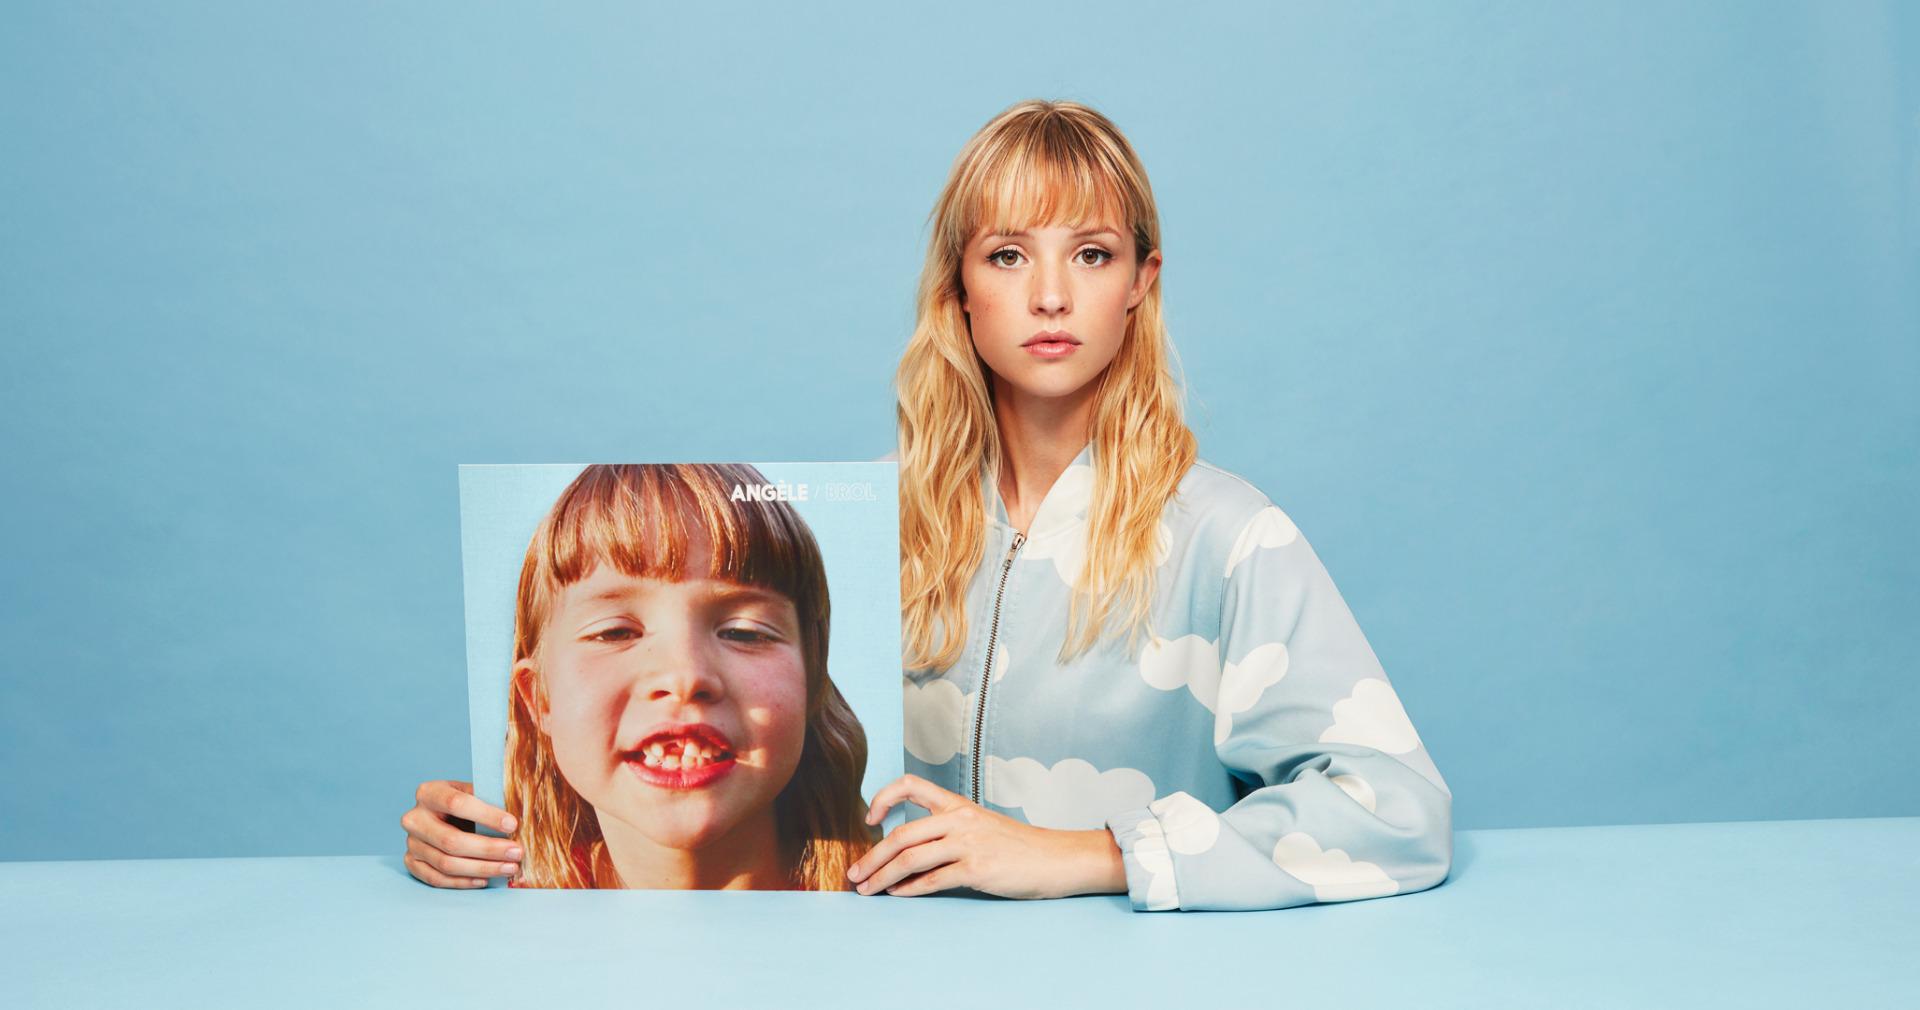 Angèle, avant / après. Photo Charlotte ABRAMOW